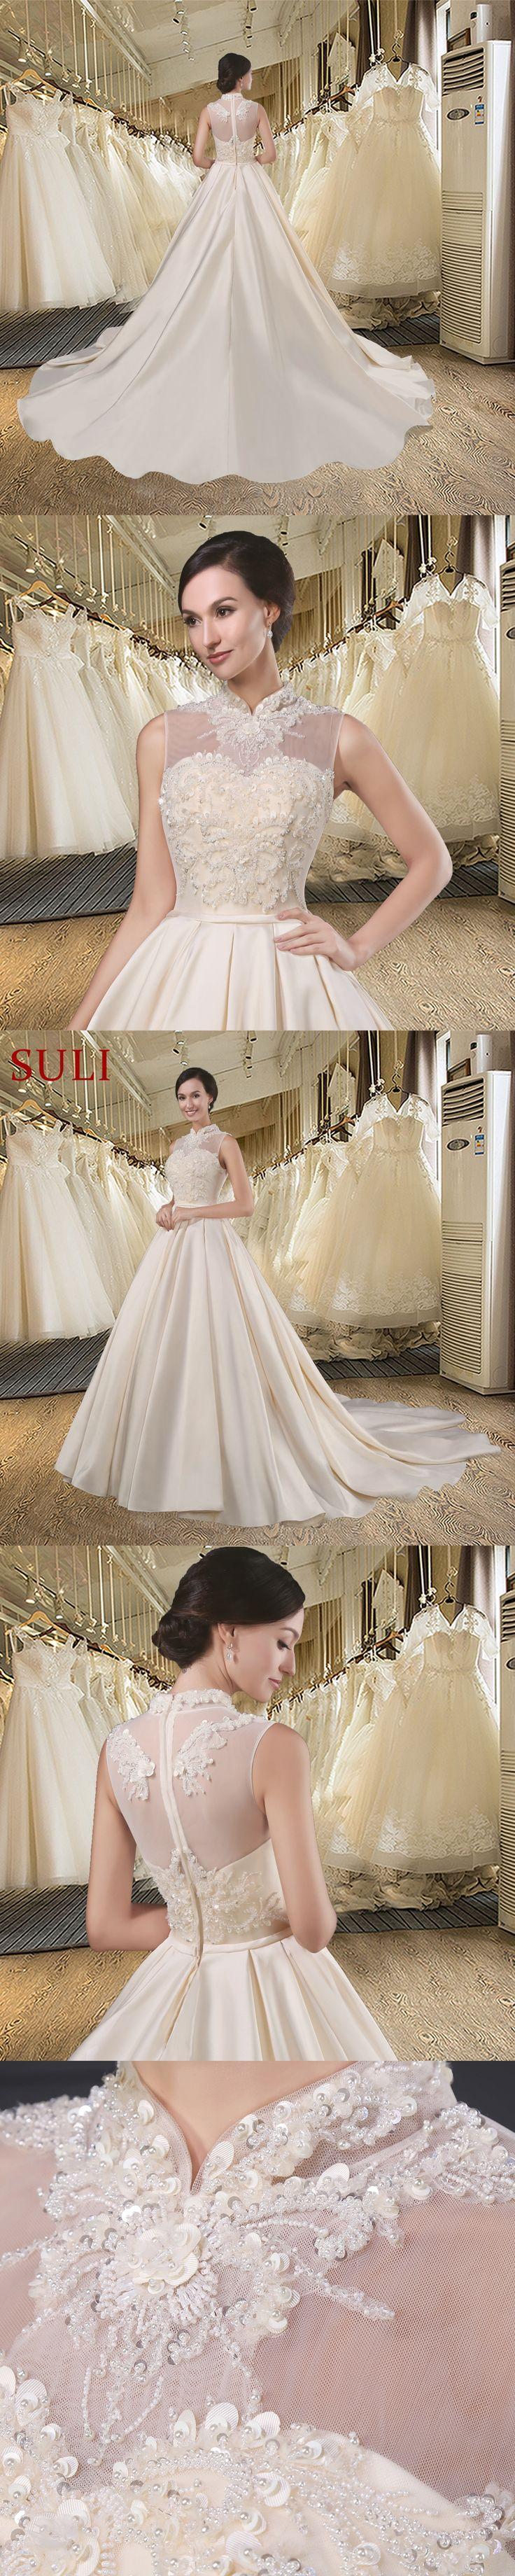 SL029 Elegant Champagne A-line Wedding Dress Romantic Appliques beaded High-neck princess classical Bridal Gown vestido de noiva